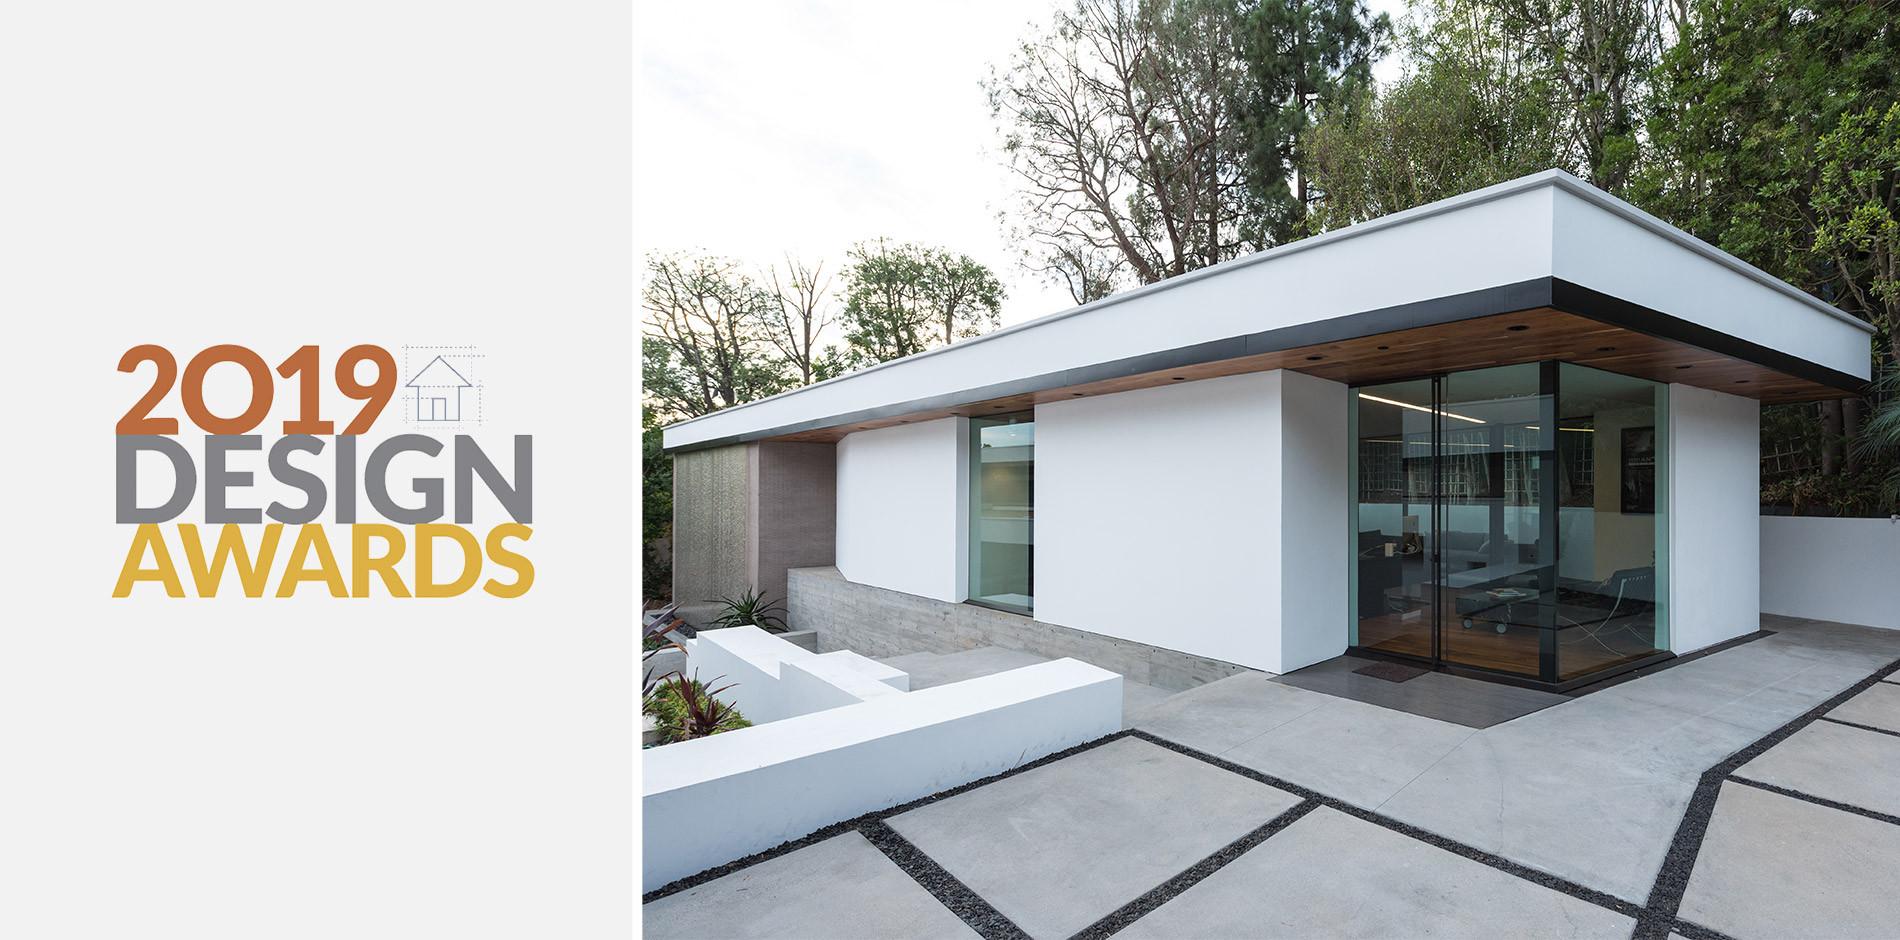 Luxury Homes Project Wins Pro Remodeler Design Award